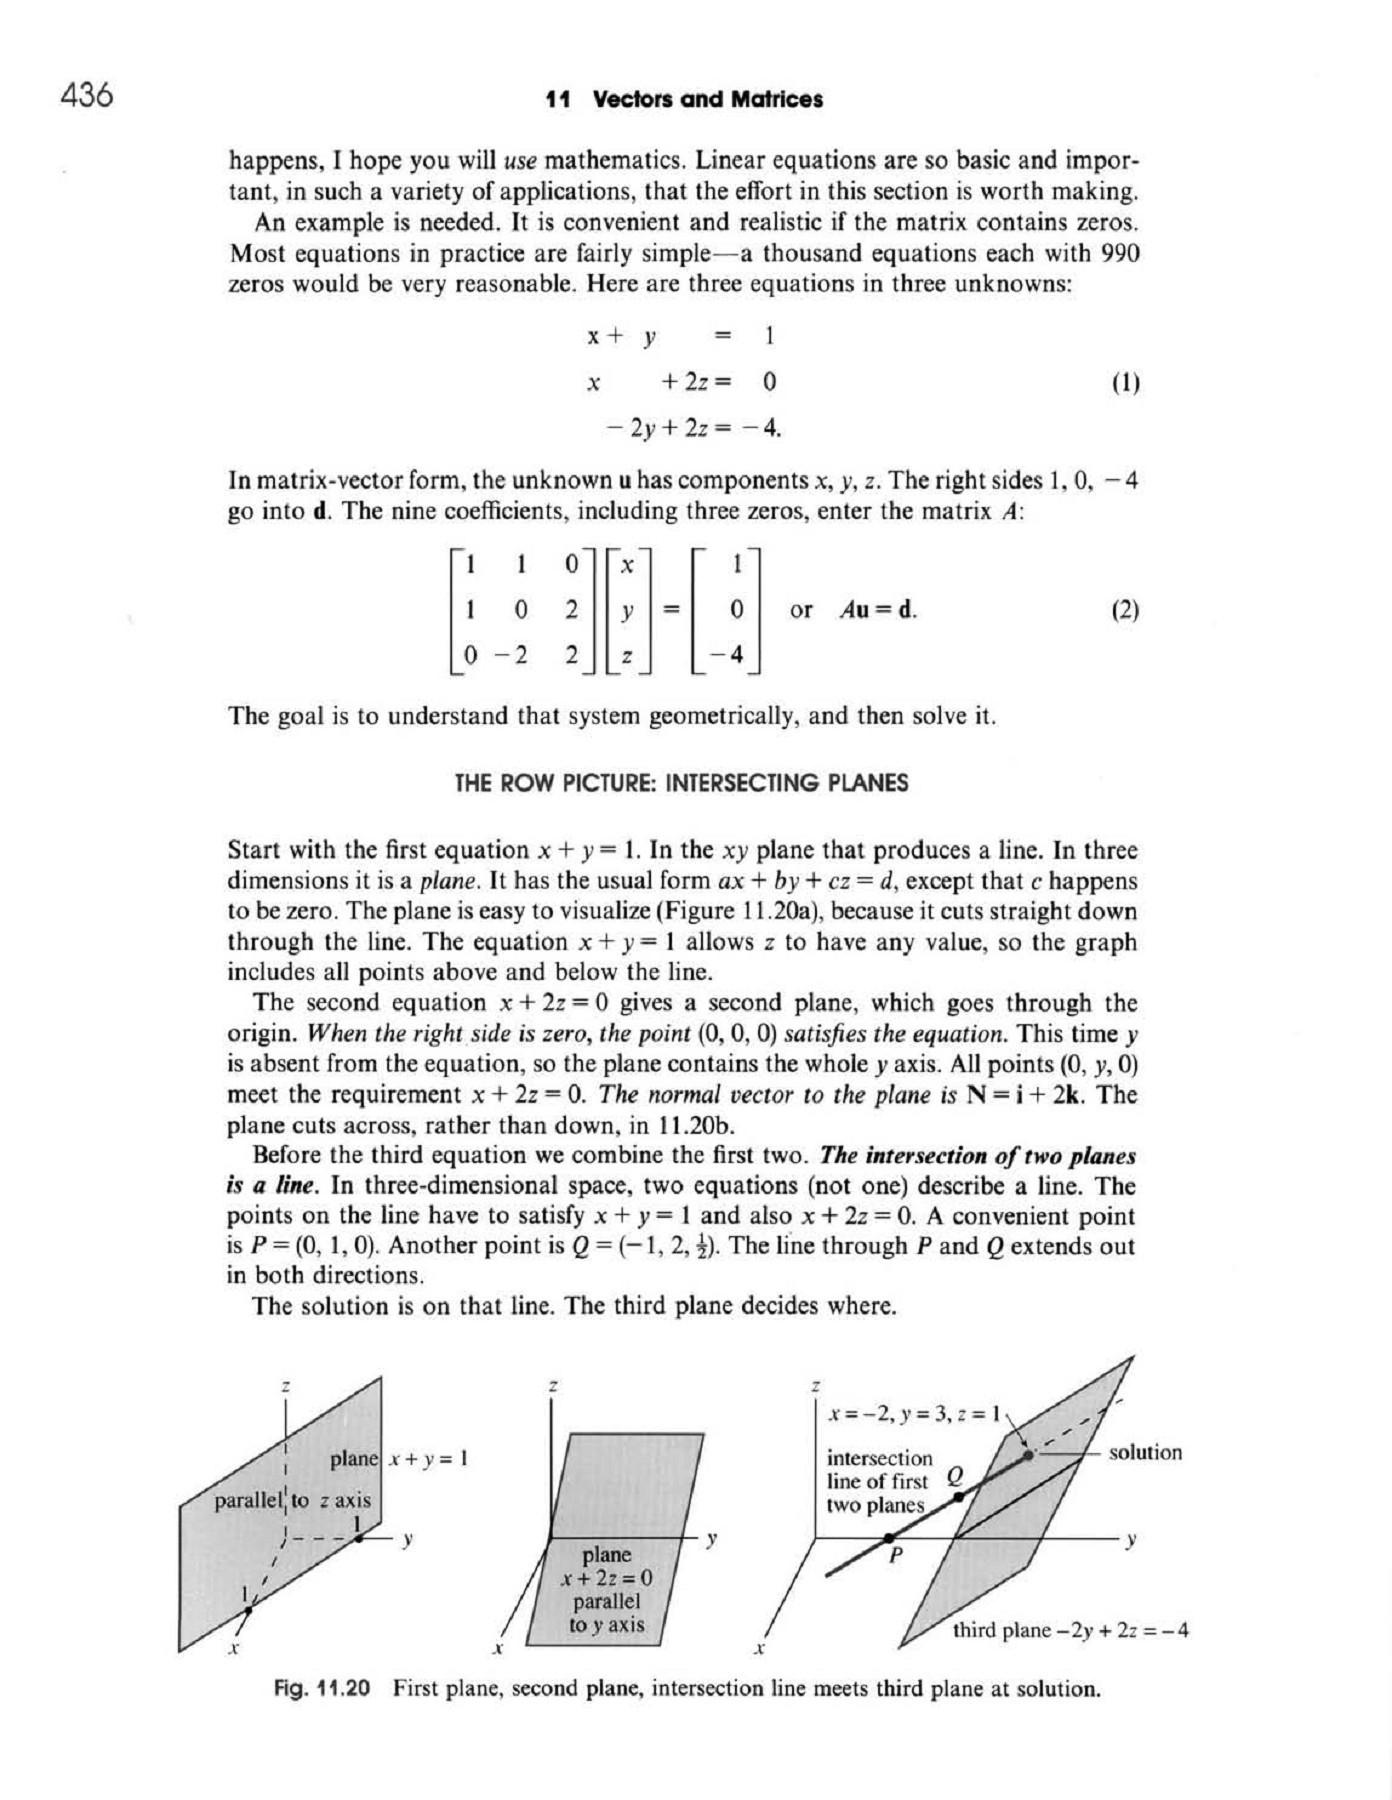 Nota Fizik Tingkatan 4 Yang Terbaik Calculus Pages 451 500 Text Version Fliphtml5 Of Himpunan Nota Fizik Tingkatan 4 Yang Terhebat Untuk Para Murid Download